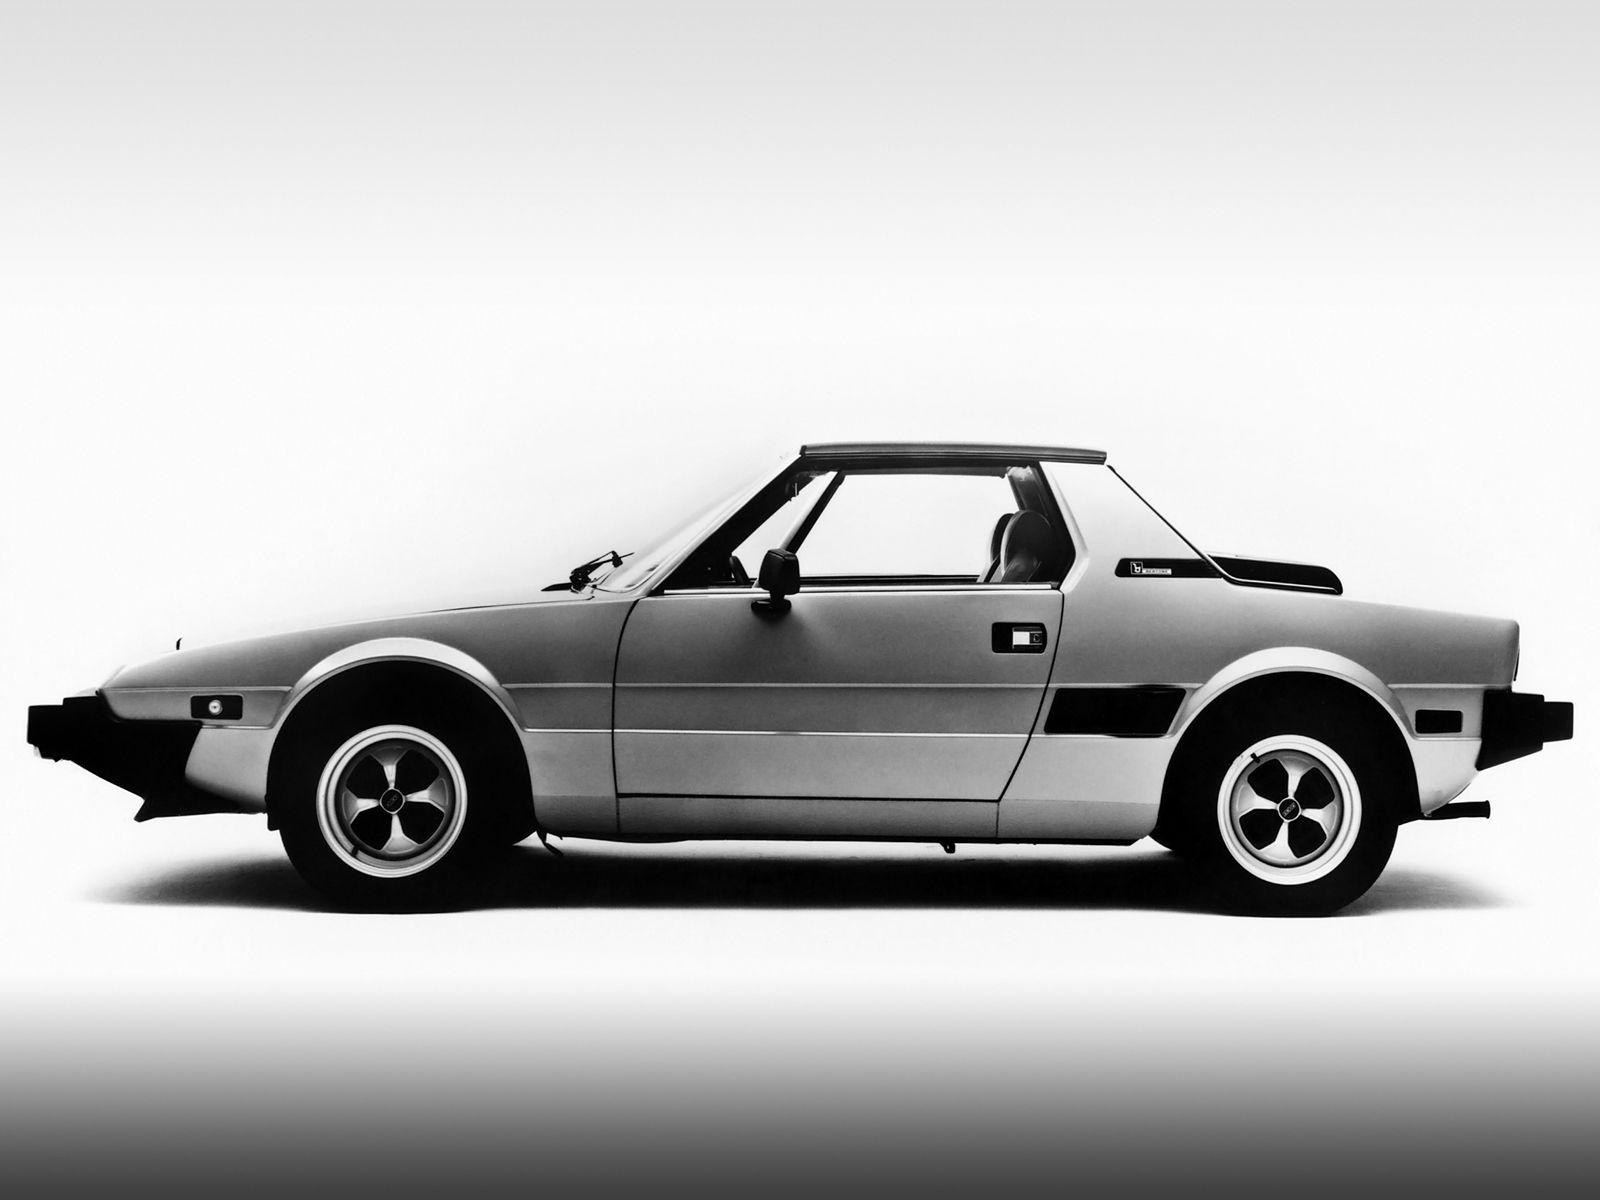 Fiat X1/9 (Bertone), 1978–82